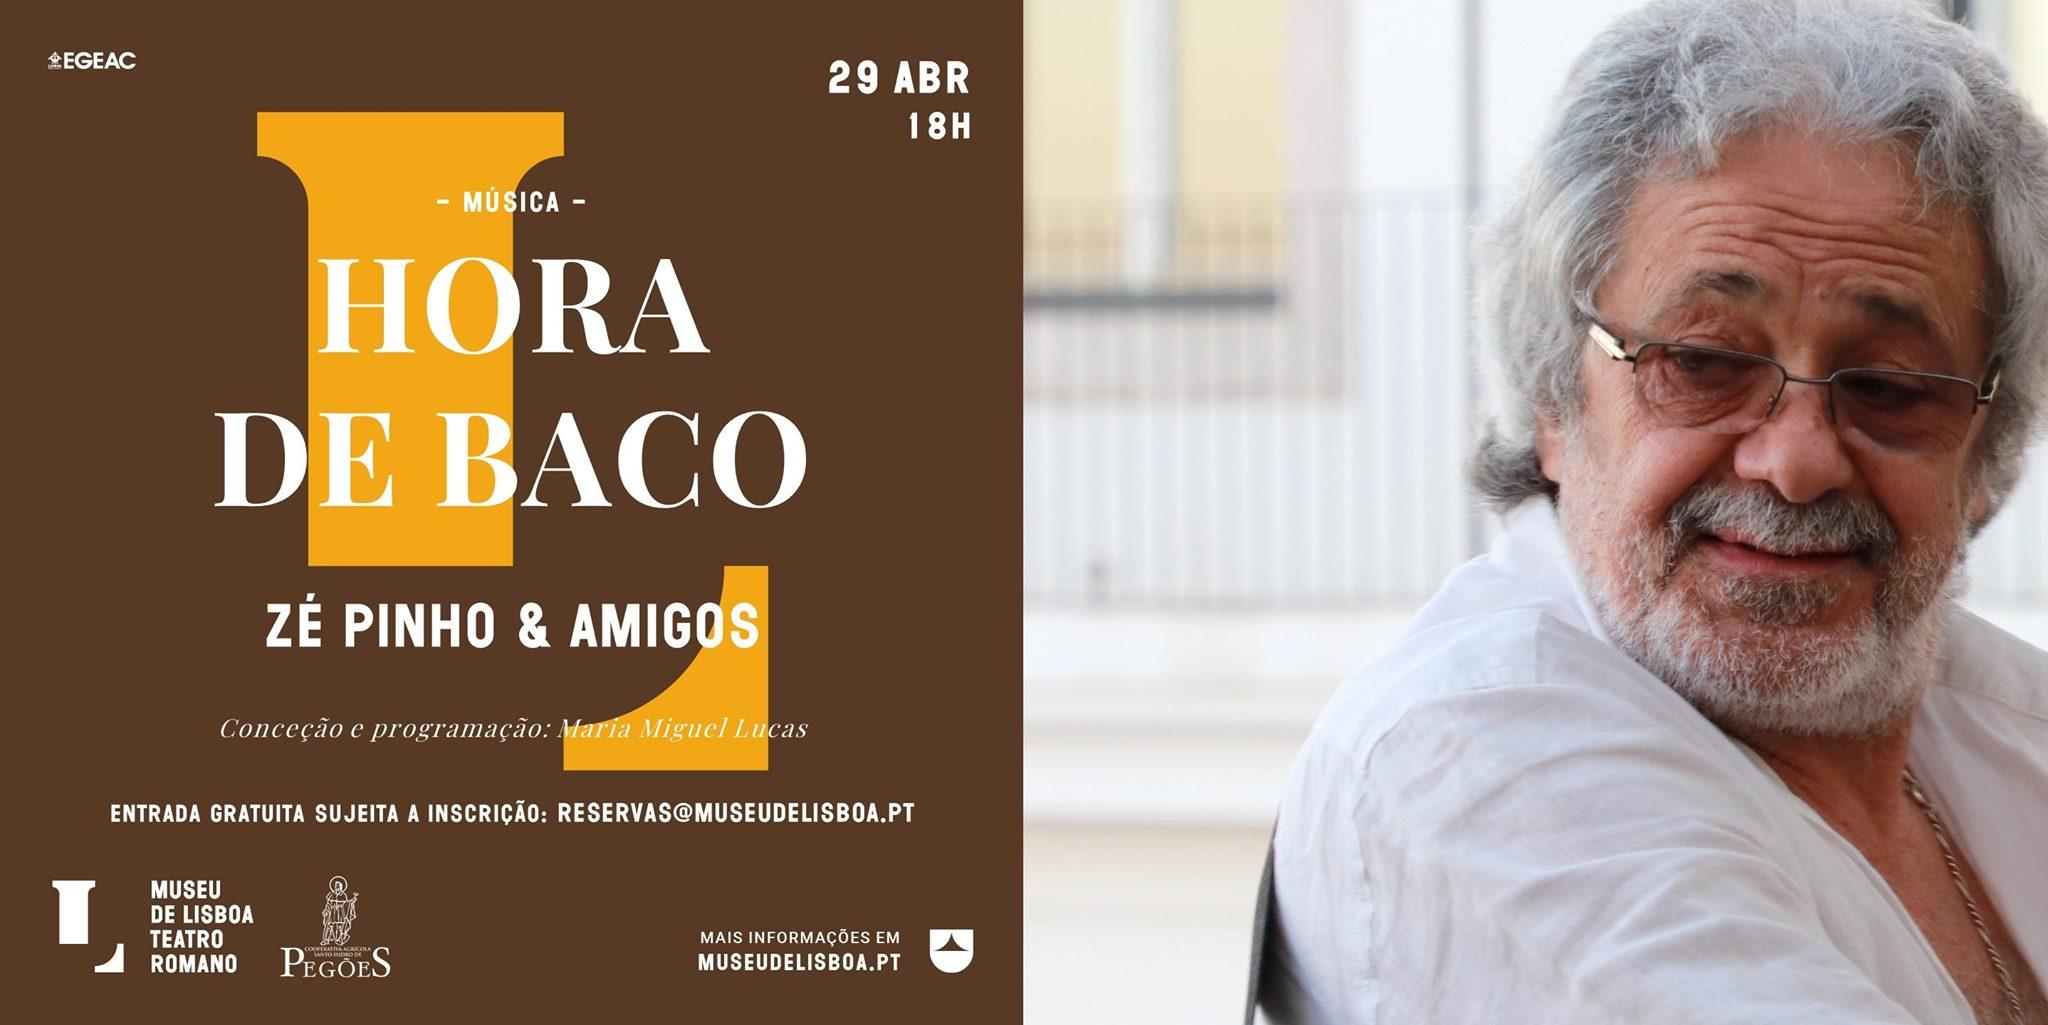 Hora de Baco no Teatro Romano | Zé Pinho & Amigos